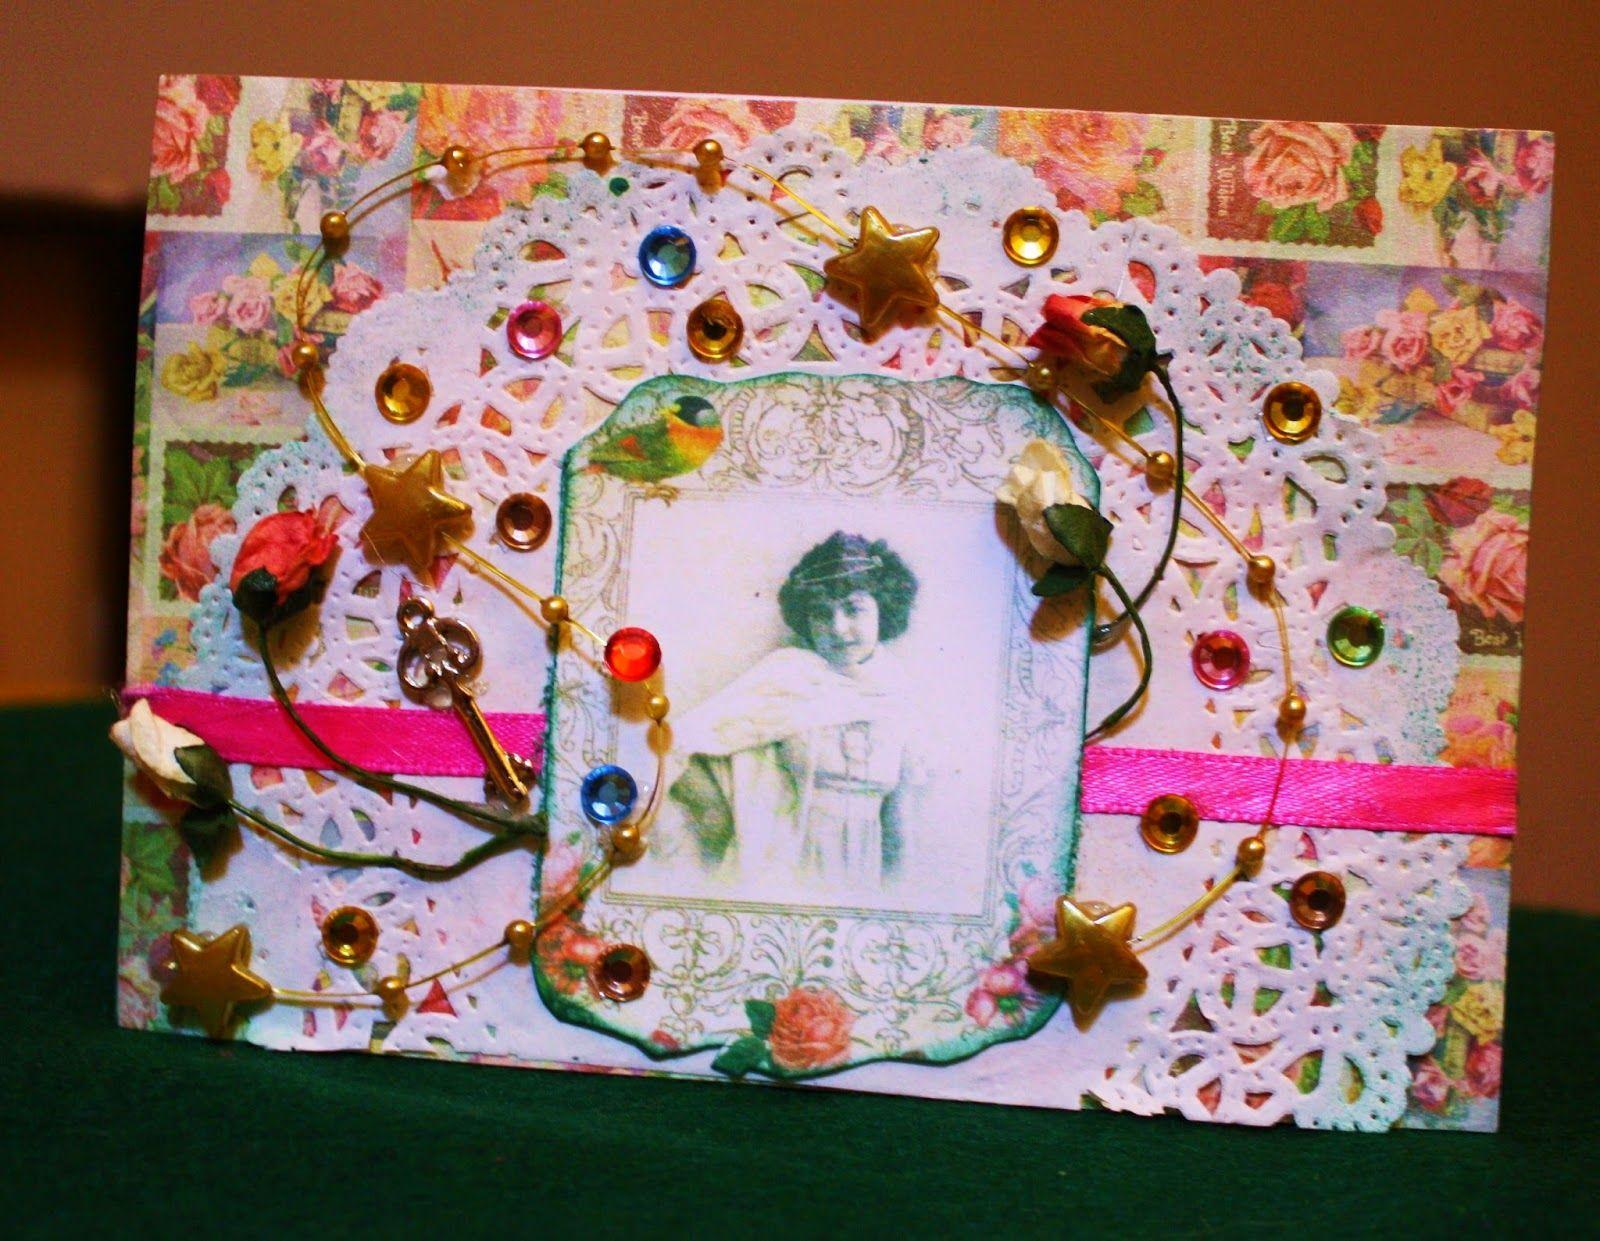 Soo's Creaxions: Audrey's 21st Birthday